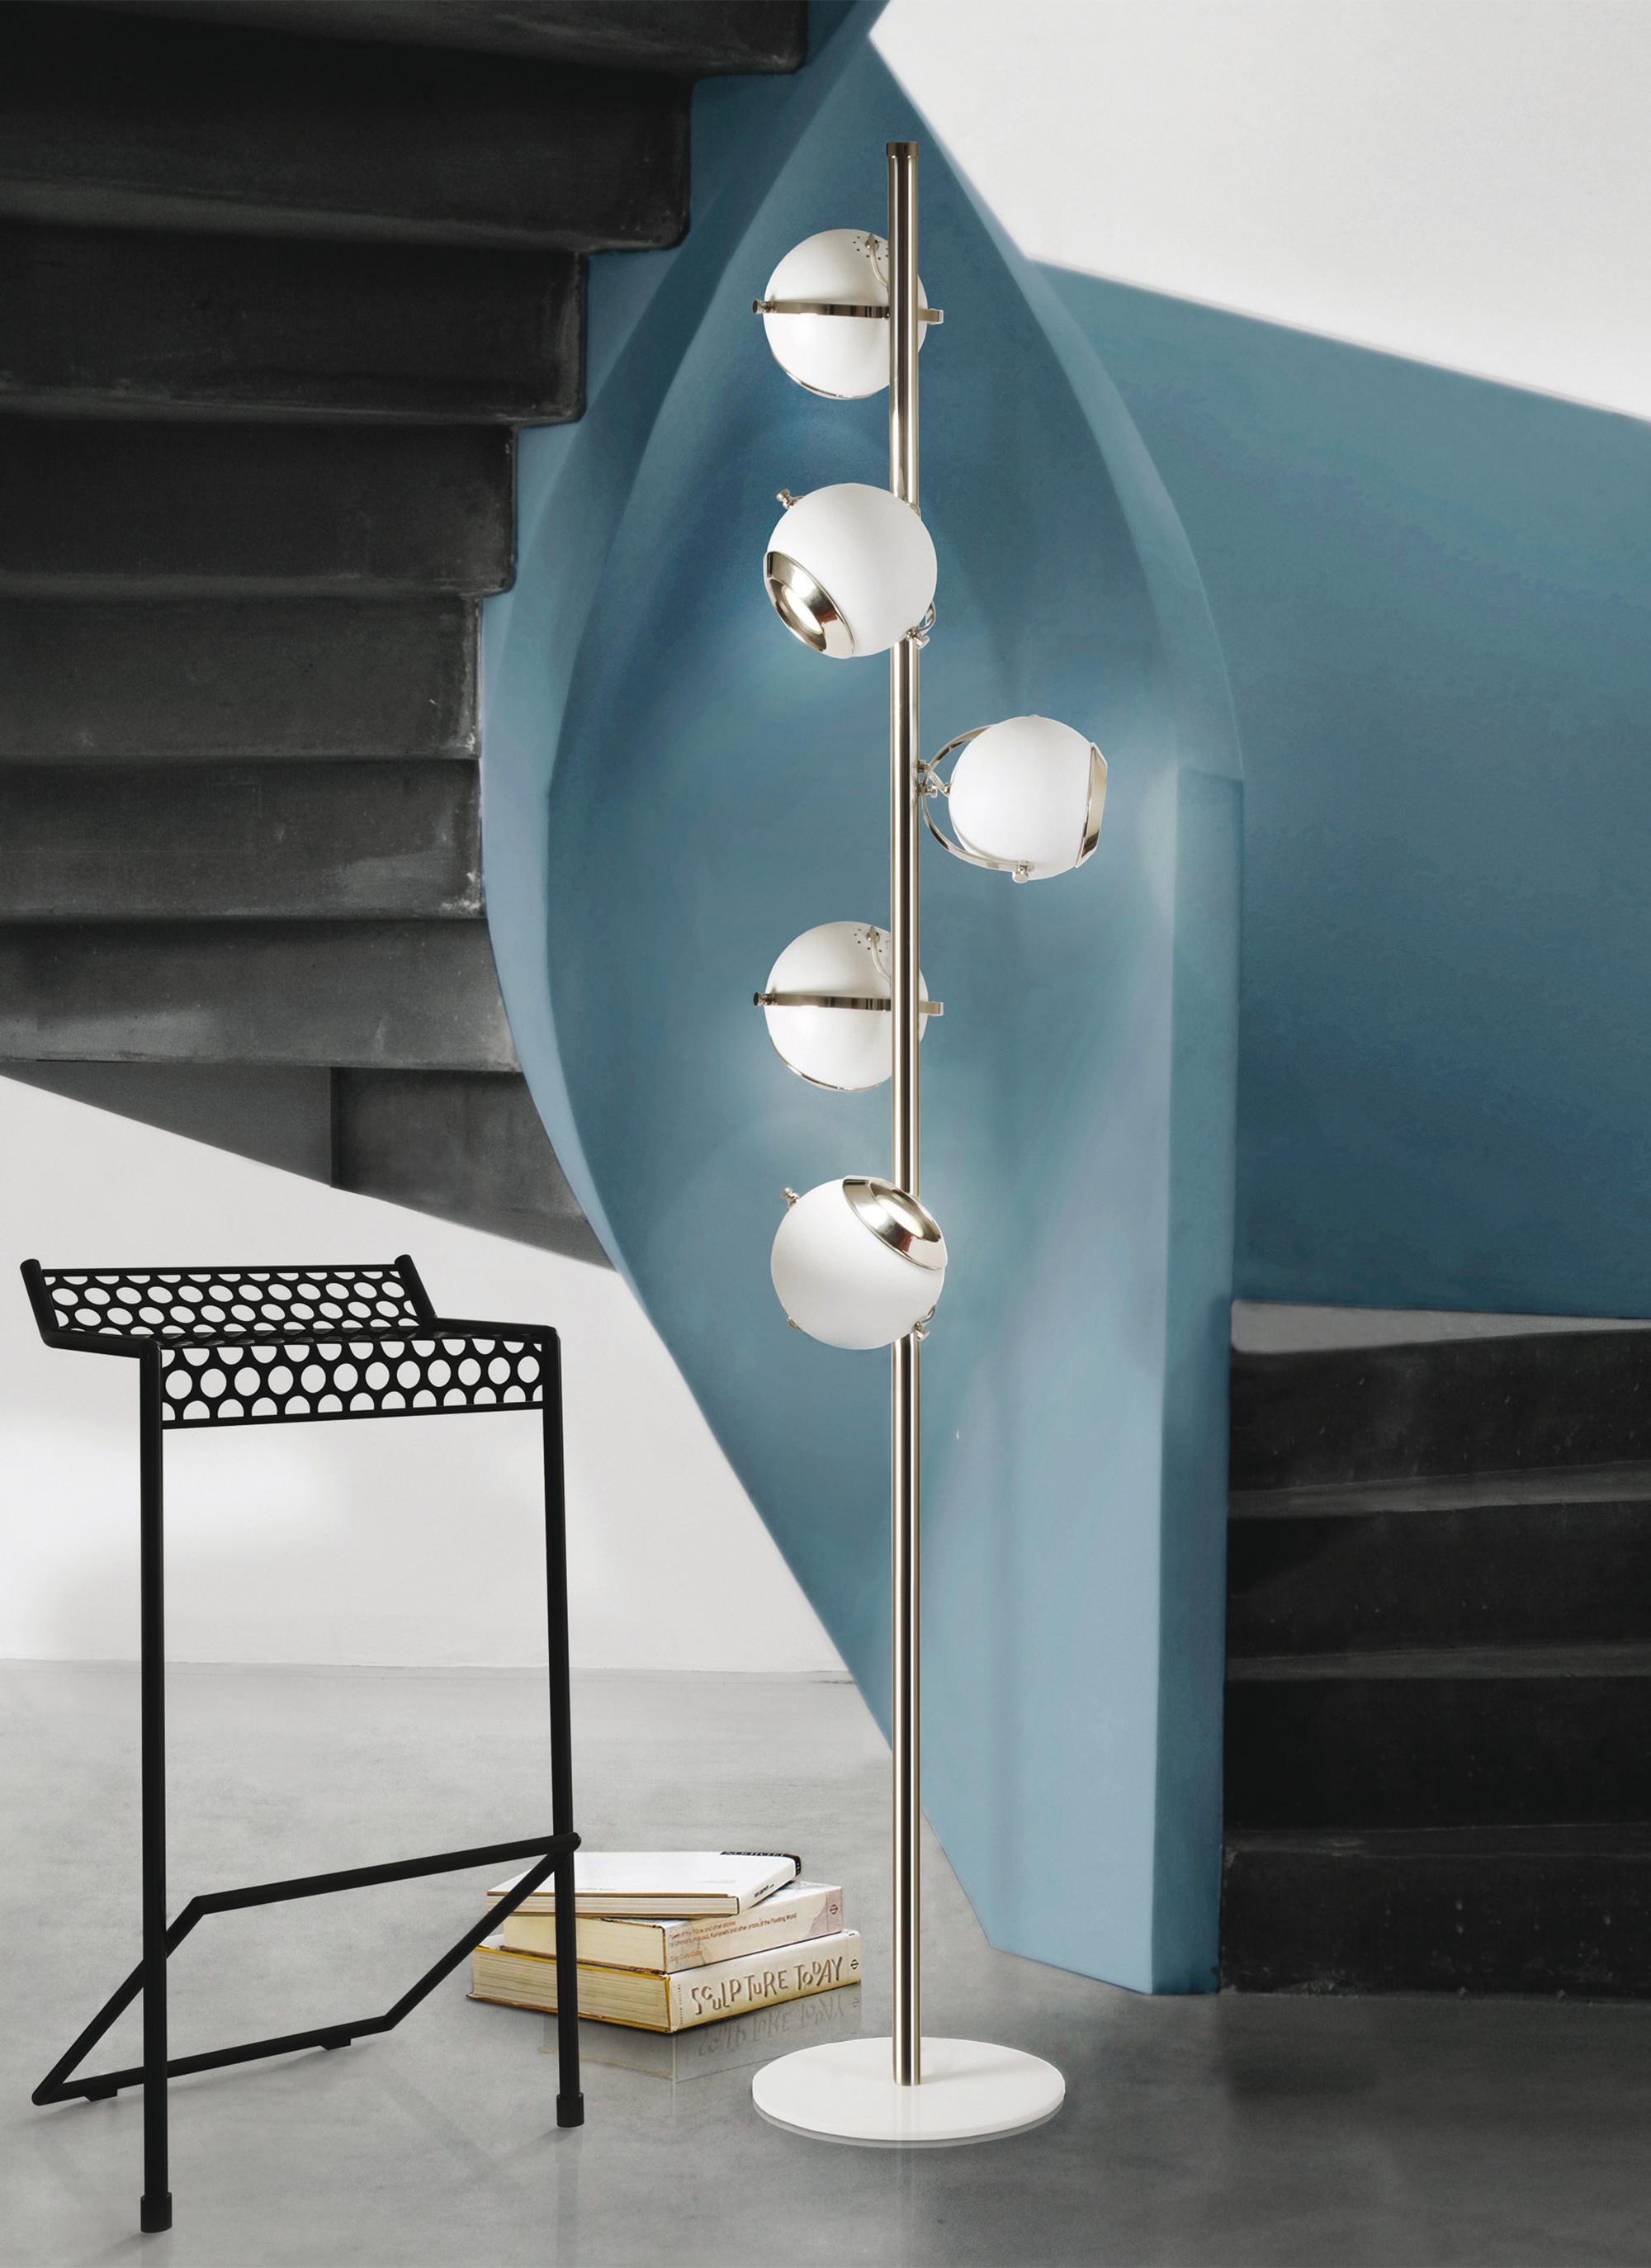 Modern Lighting Ideas The Ideal Light For a Children Room Design! 2